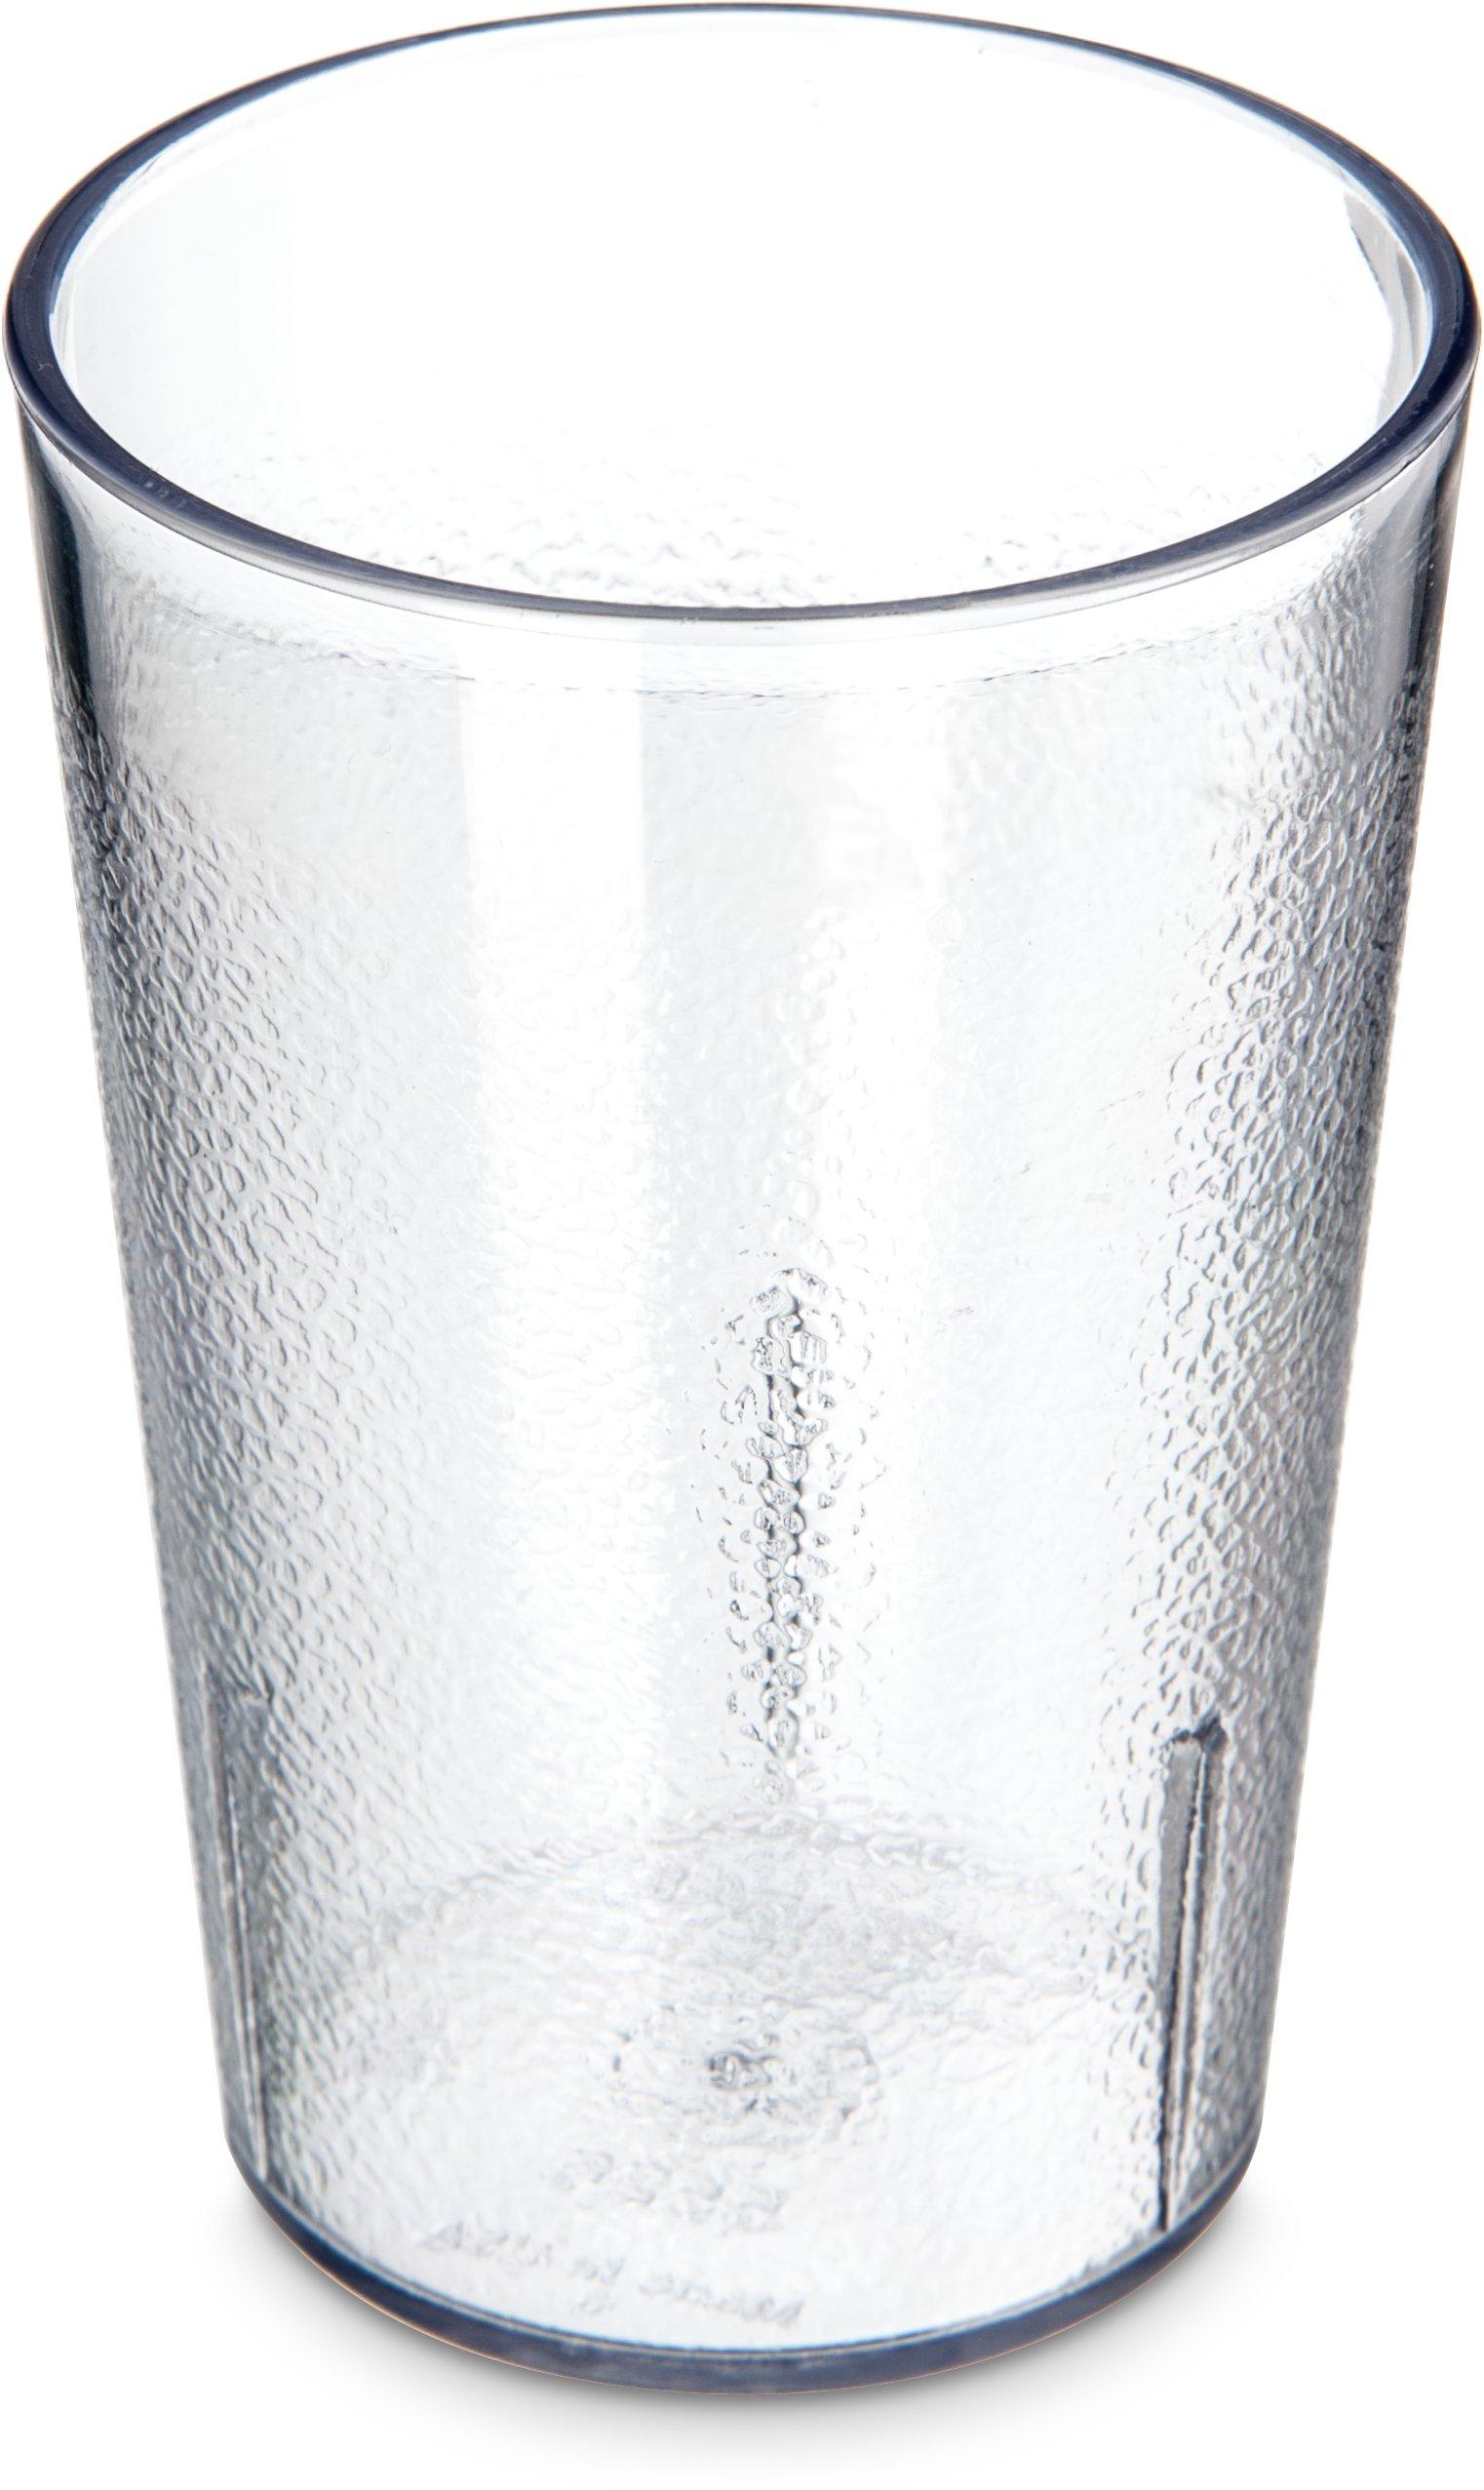 Carlisle 55268107 Stackable ShatterResistant Plastic Tumbler, 8 oz, Clear (Pack of 6)